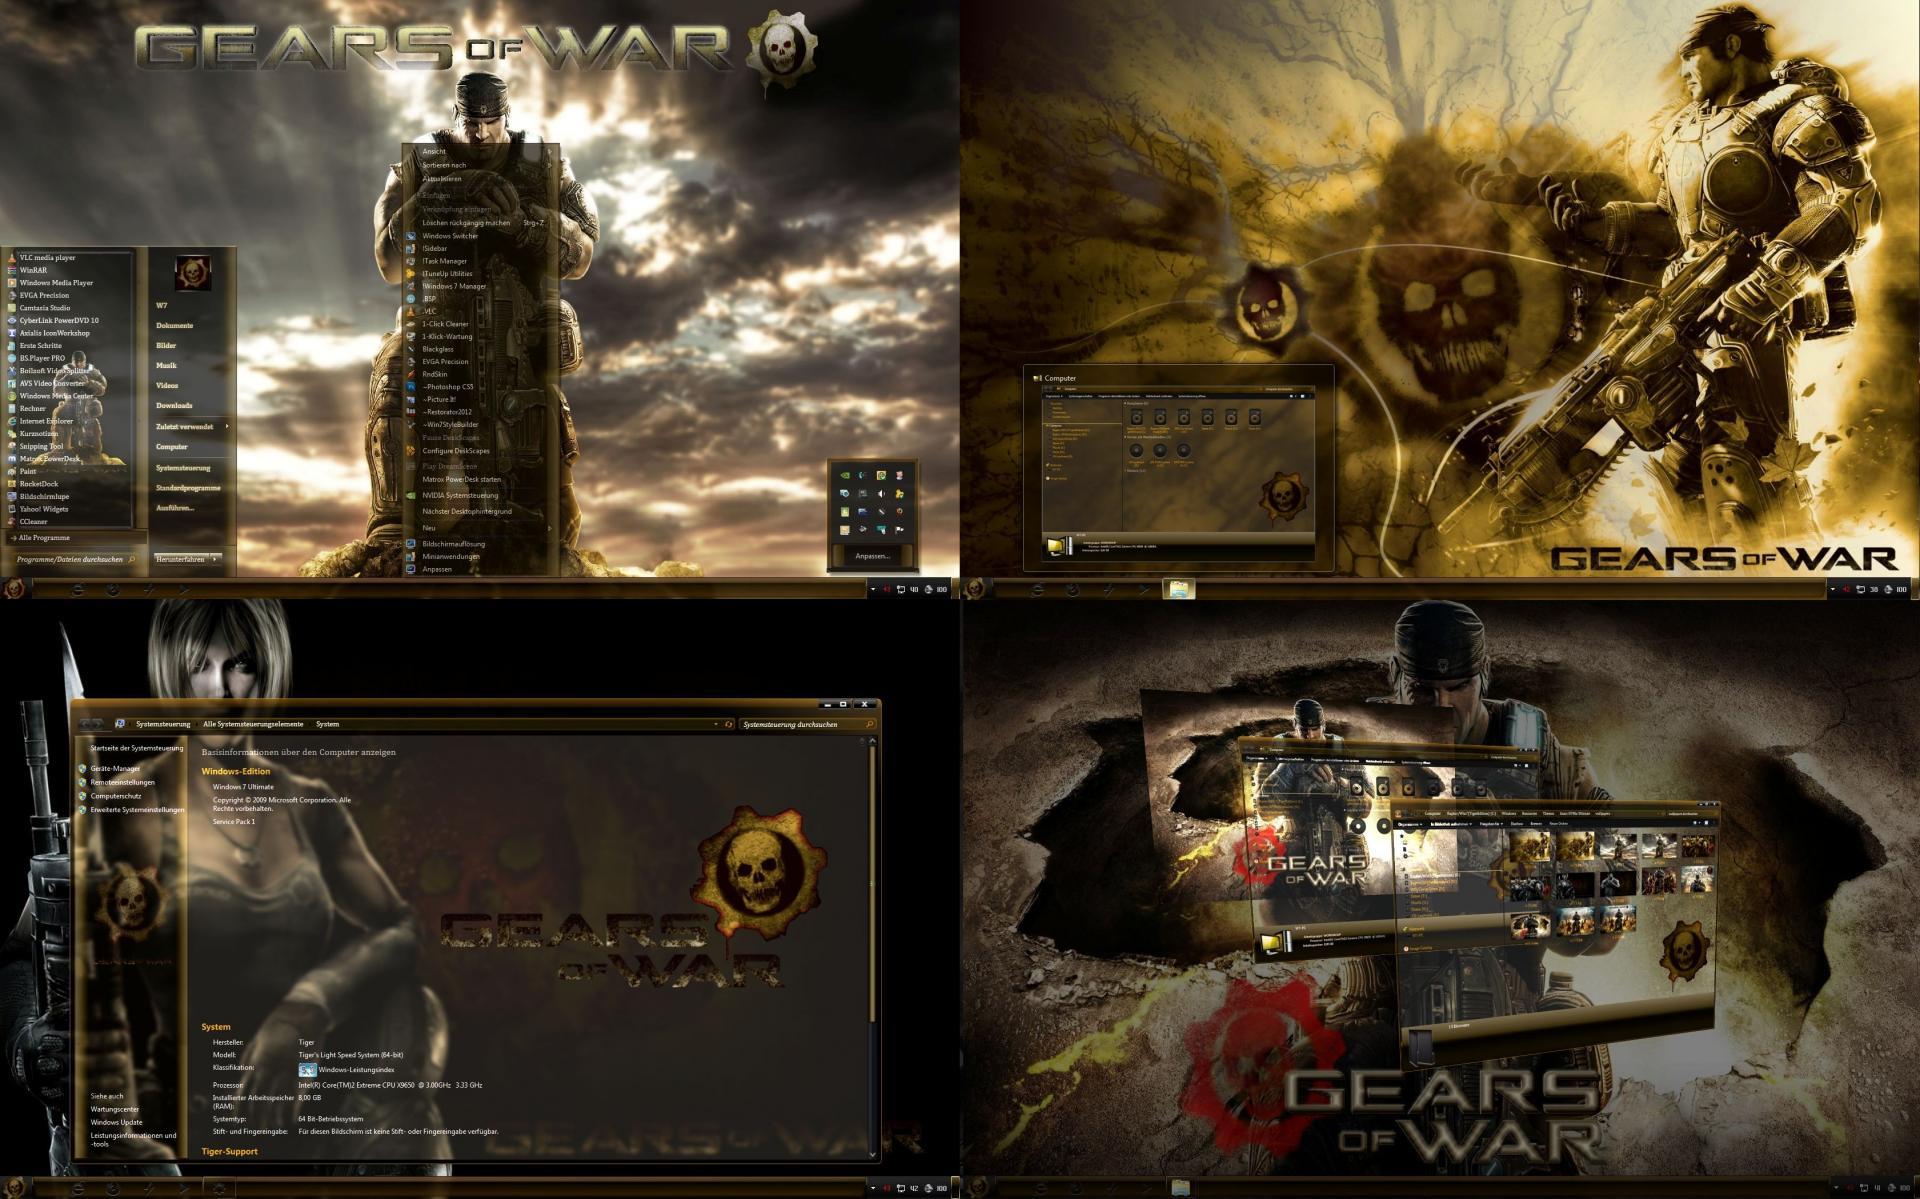 Gears of war theme windows 7